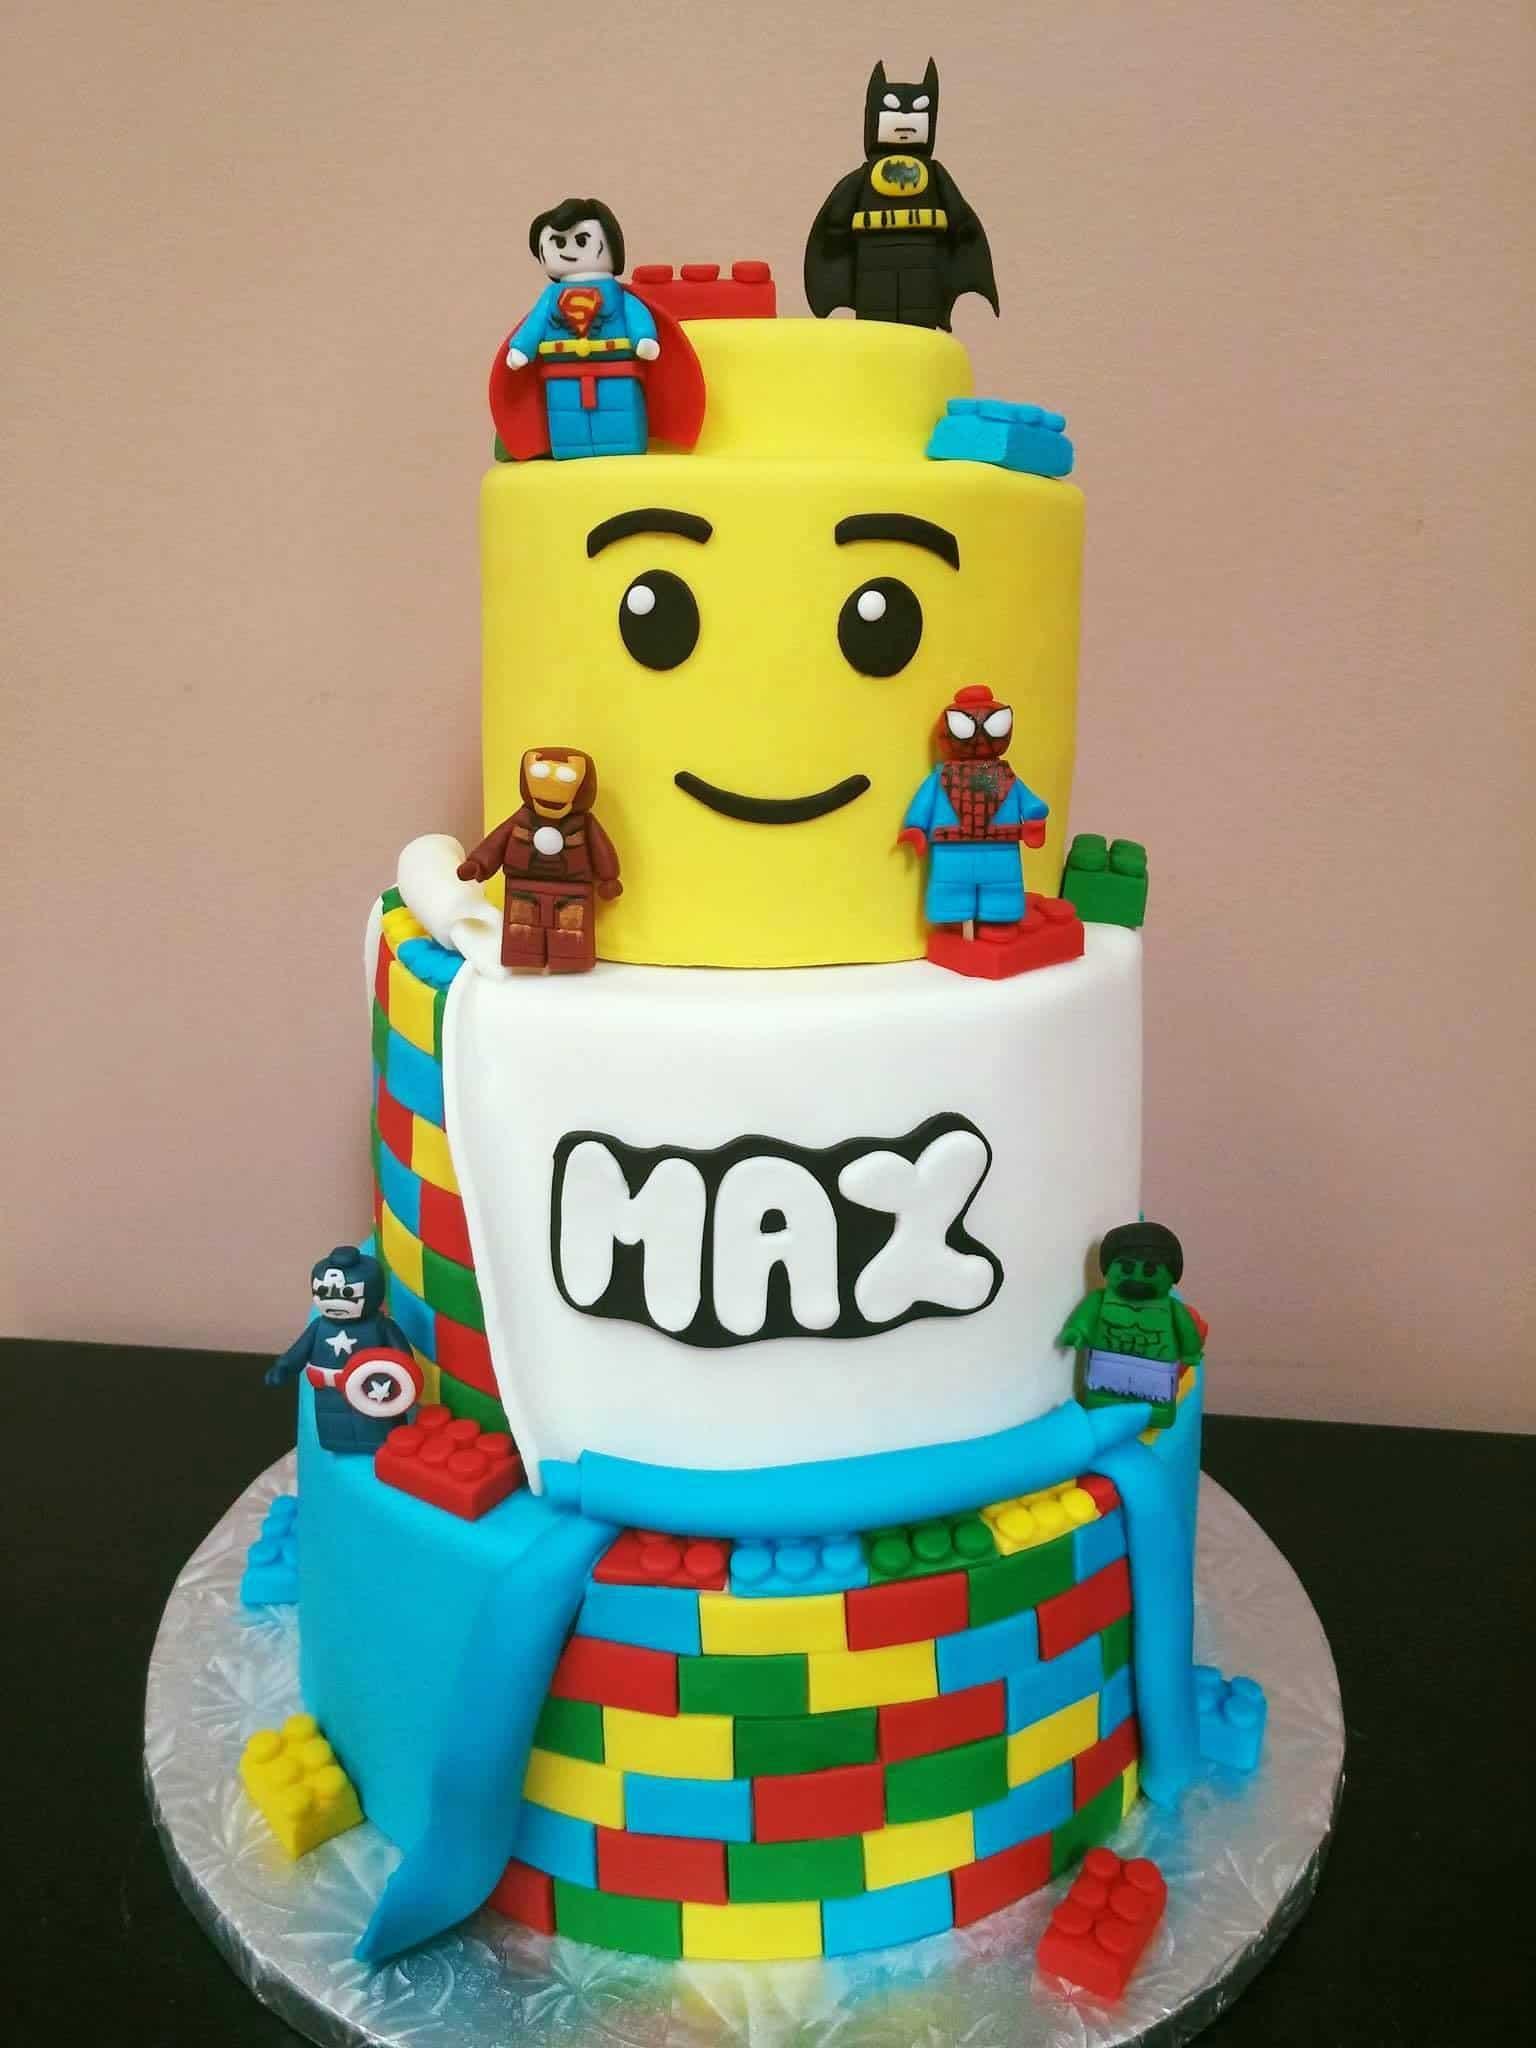 Lego Cake Ideas How To Make A Lego Birthday Cake